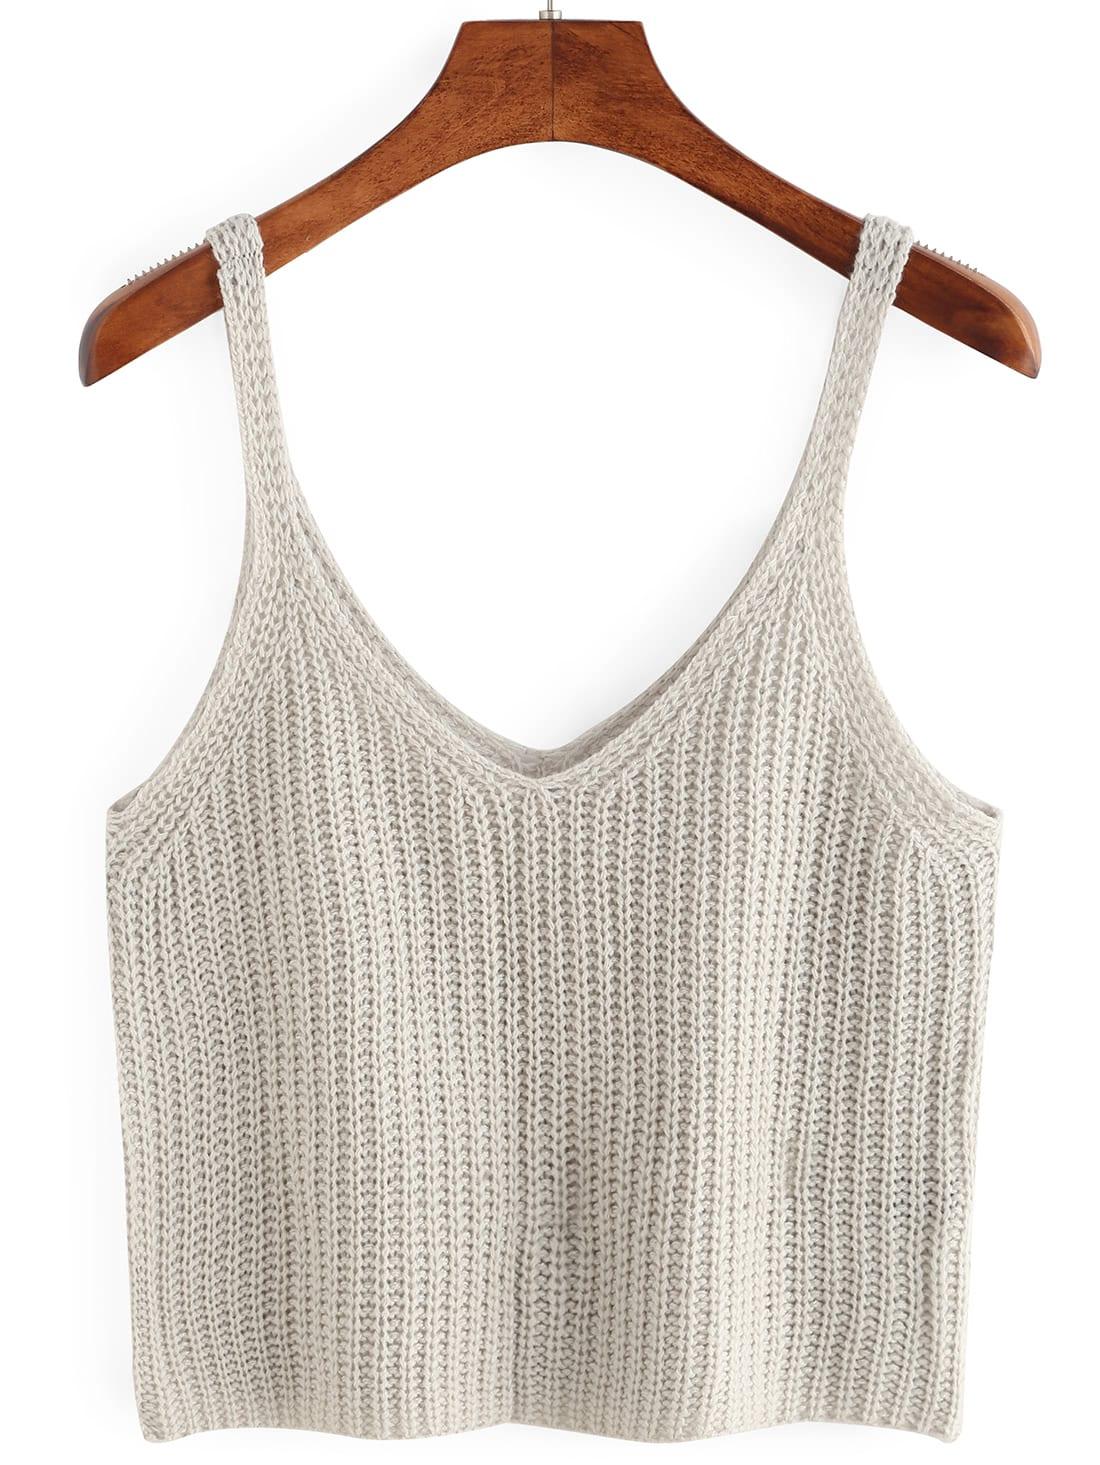 Knitted Crop Tank Top -SheIn(Sheinside)